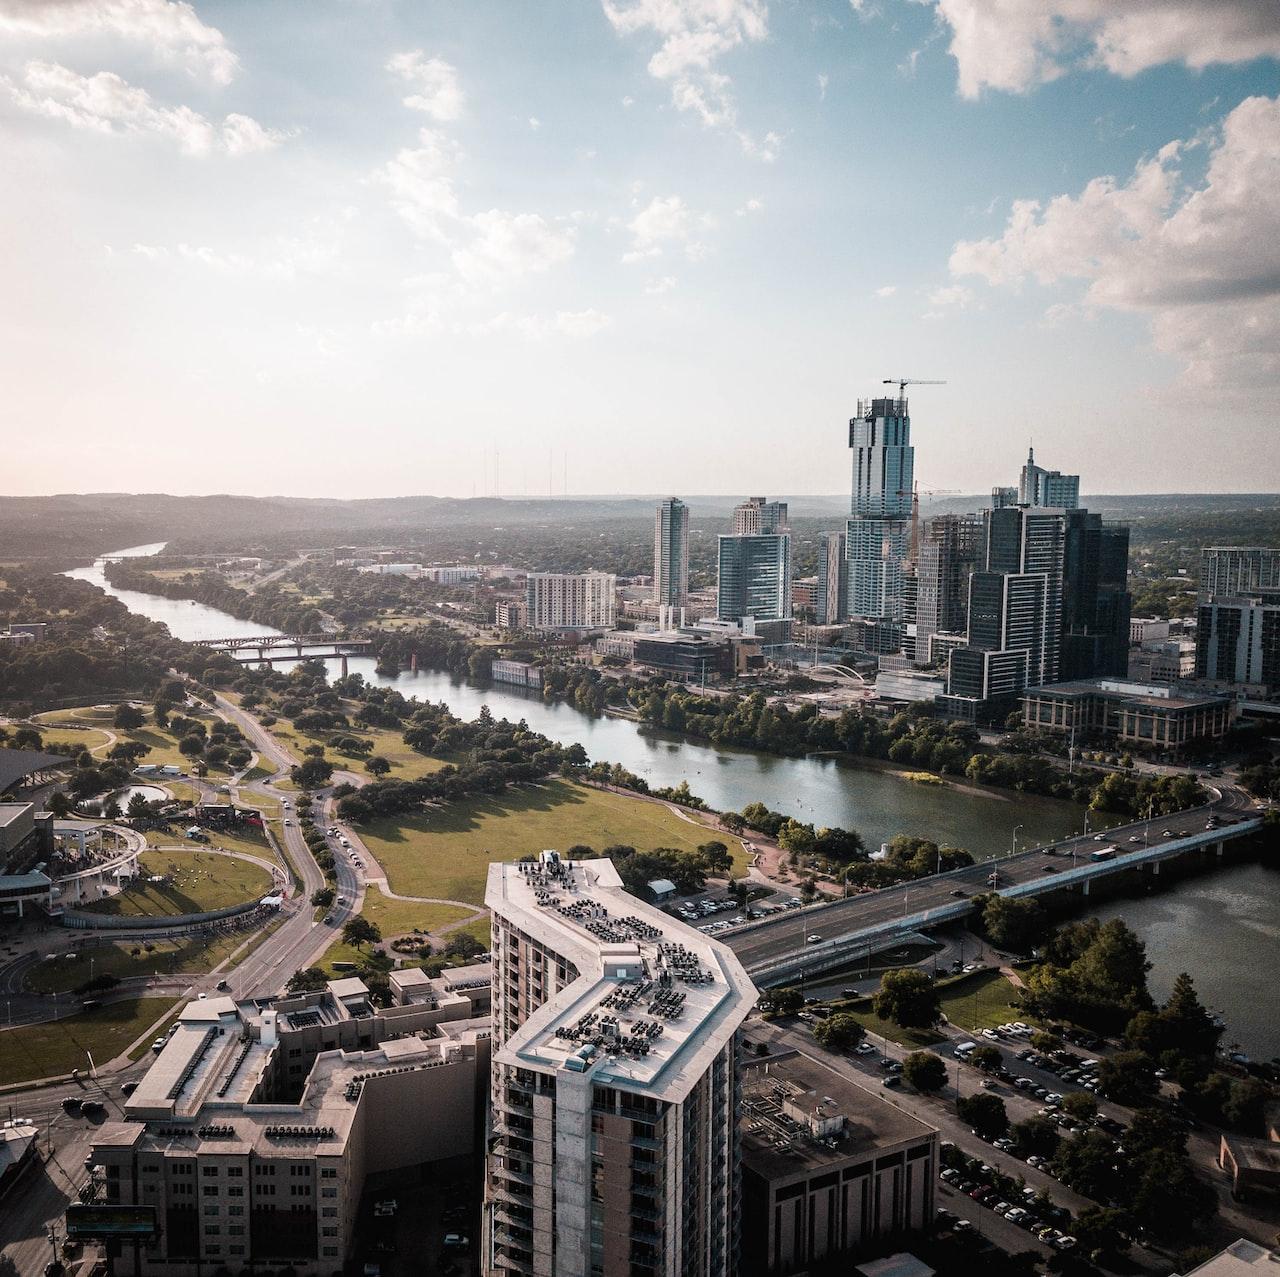 Trendy Neighborhoods in Austin for Homebuyers